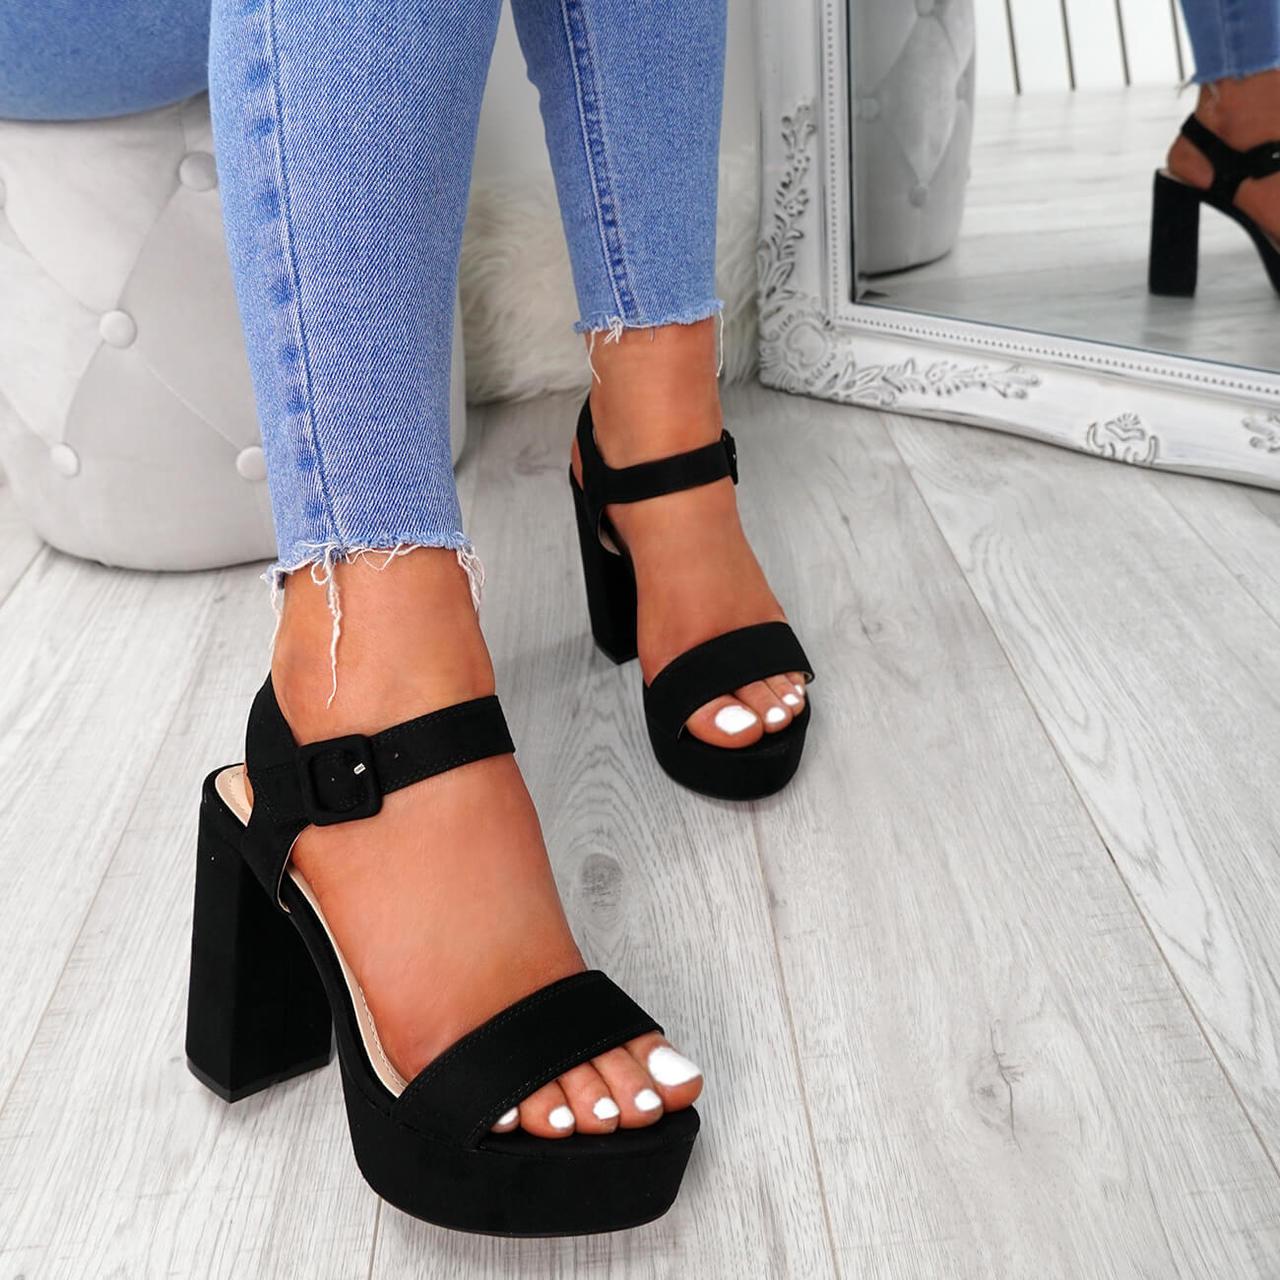 f9c39786a14 Womens Ladies Ankle Strap Buckle Sandals Platform High Block Heel Peep Toe  Shoes